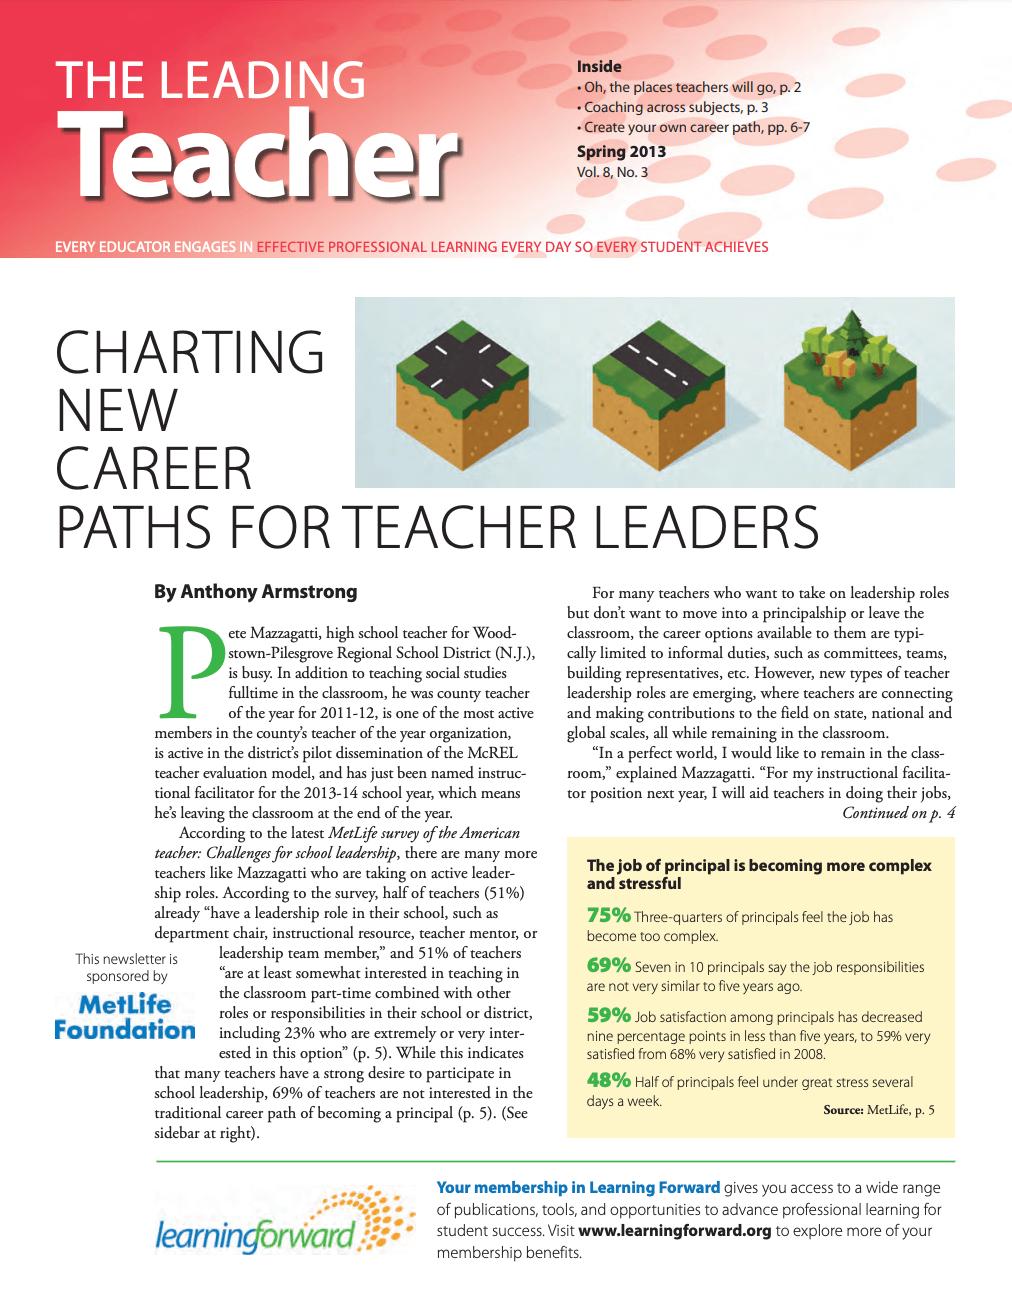 the-leading-teacher-spring-2013-vol-8-no-3